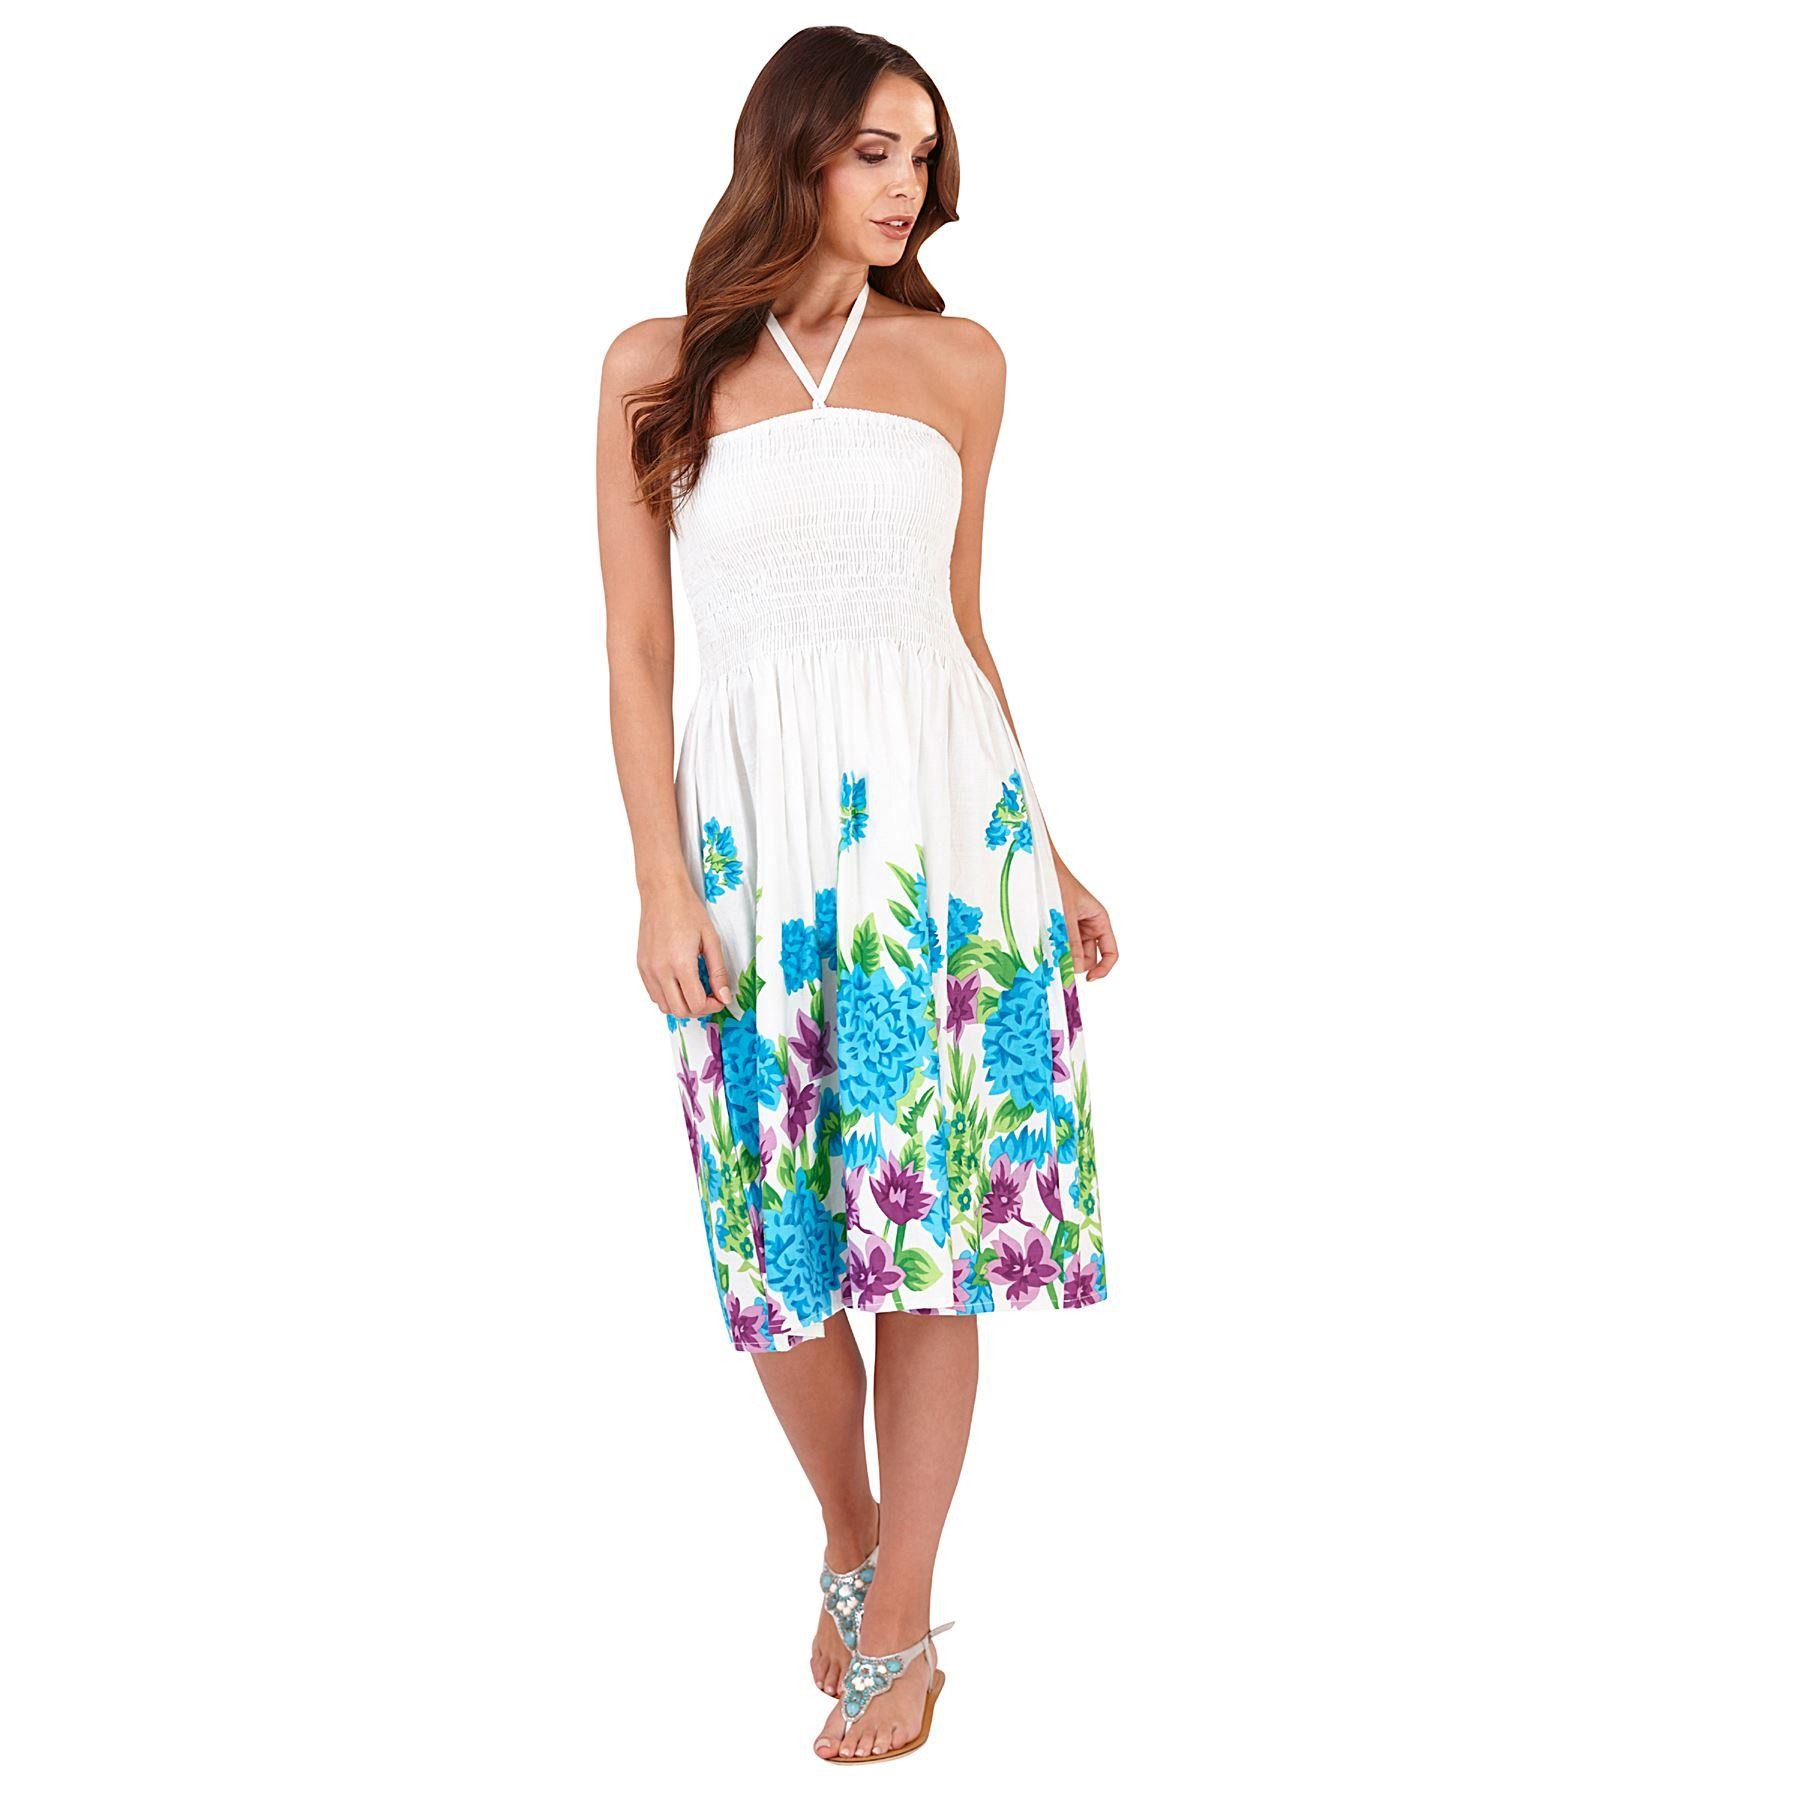 Pistachio Bold Floral Print 3 in 1 Dress - Blue